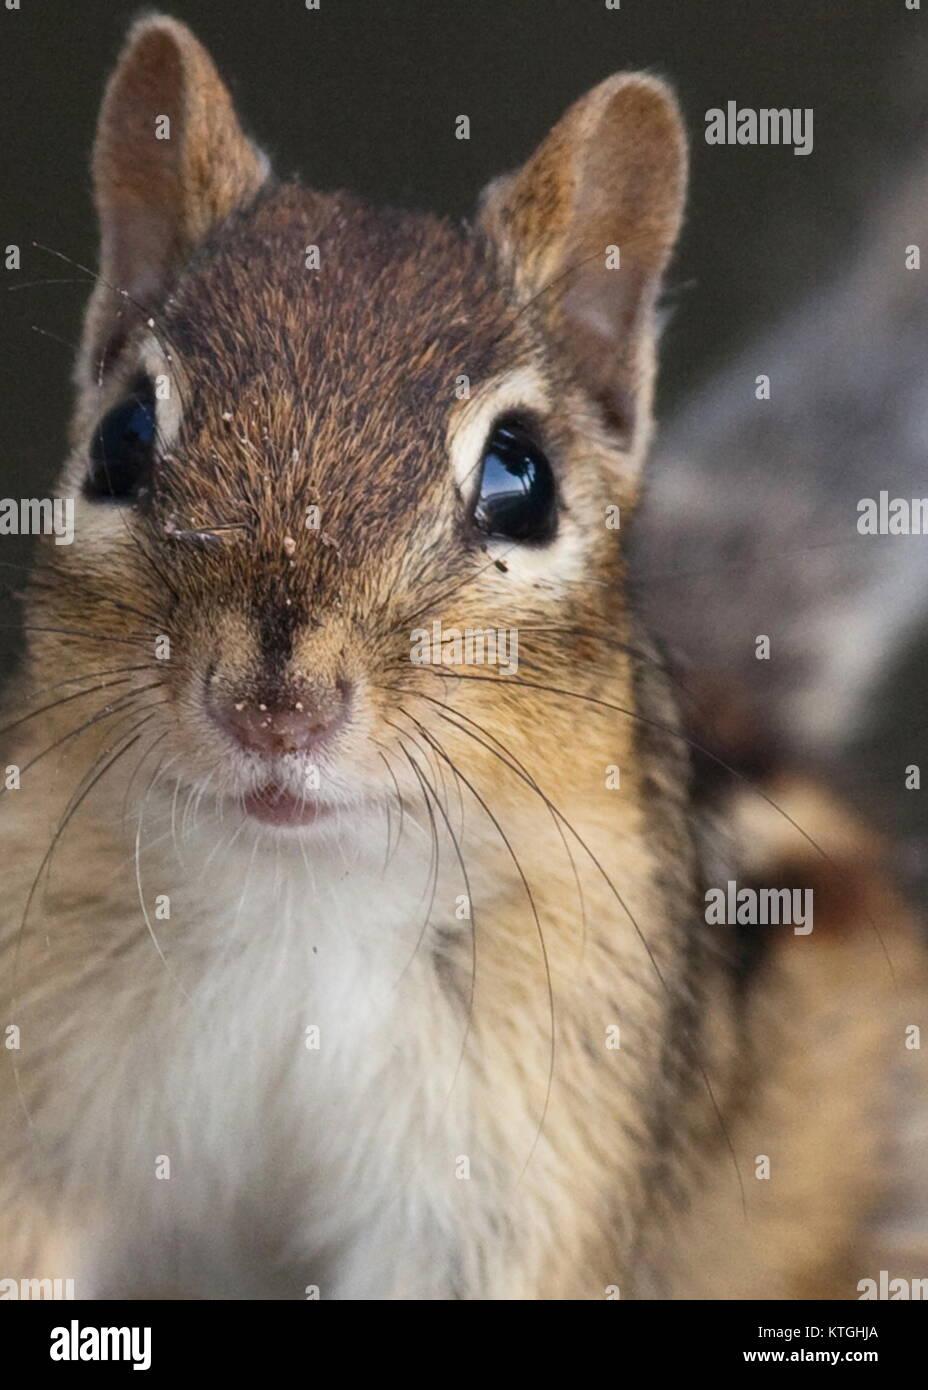 Canadian Chipmunk - Stock Image